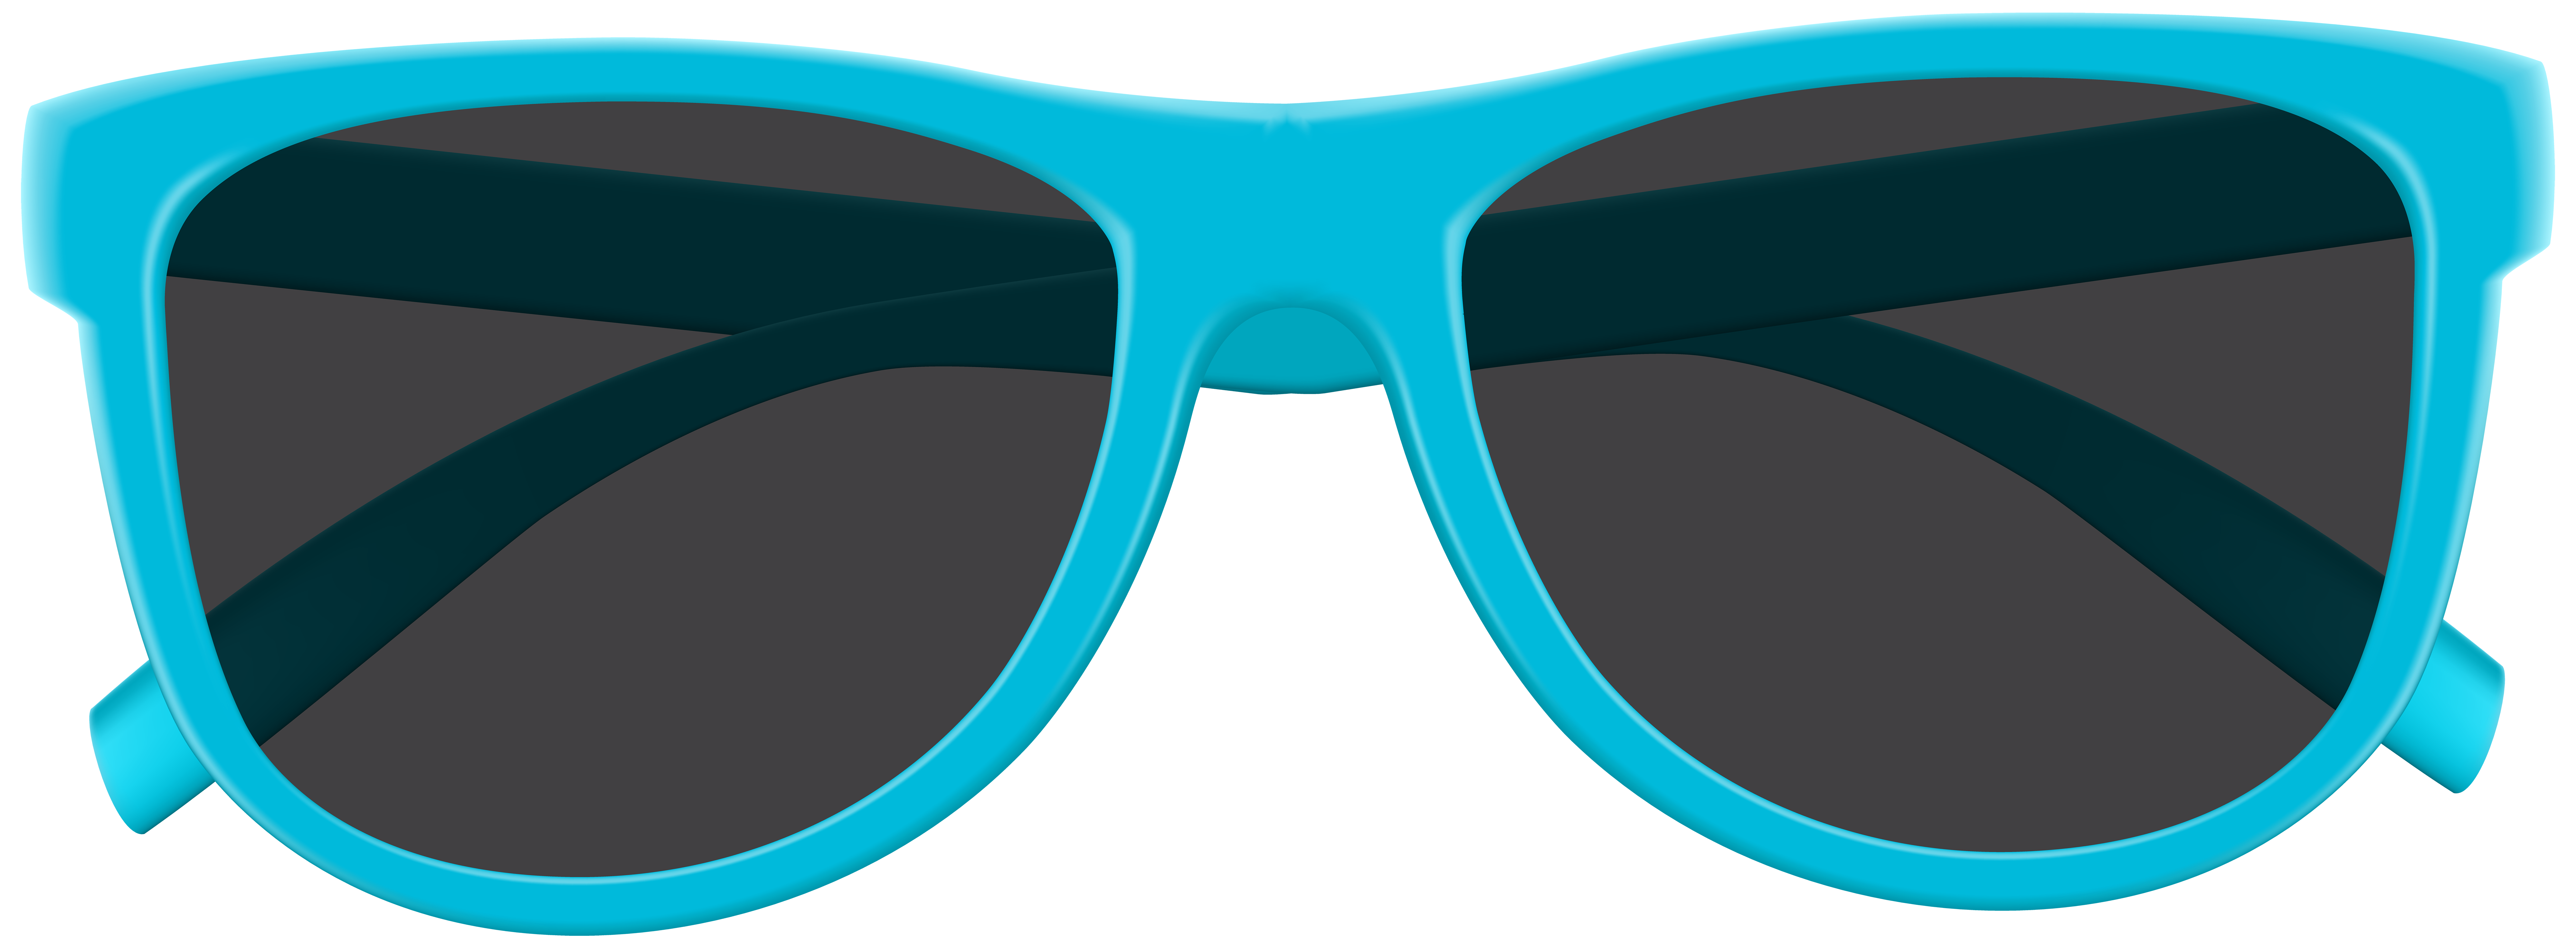 Sunglasses clipart. Blue png clip art